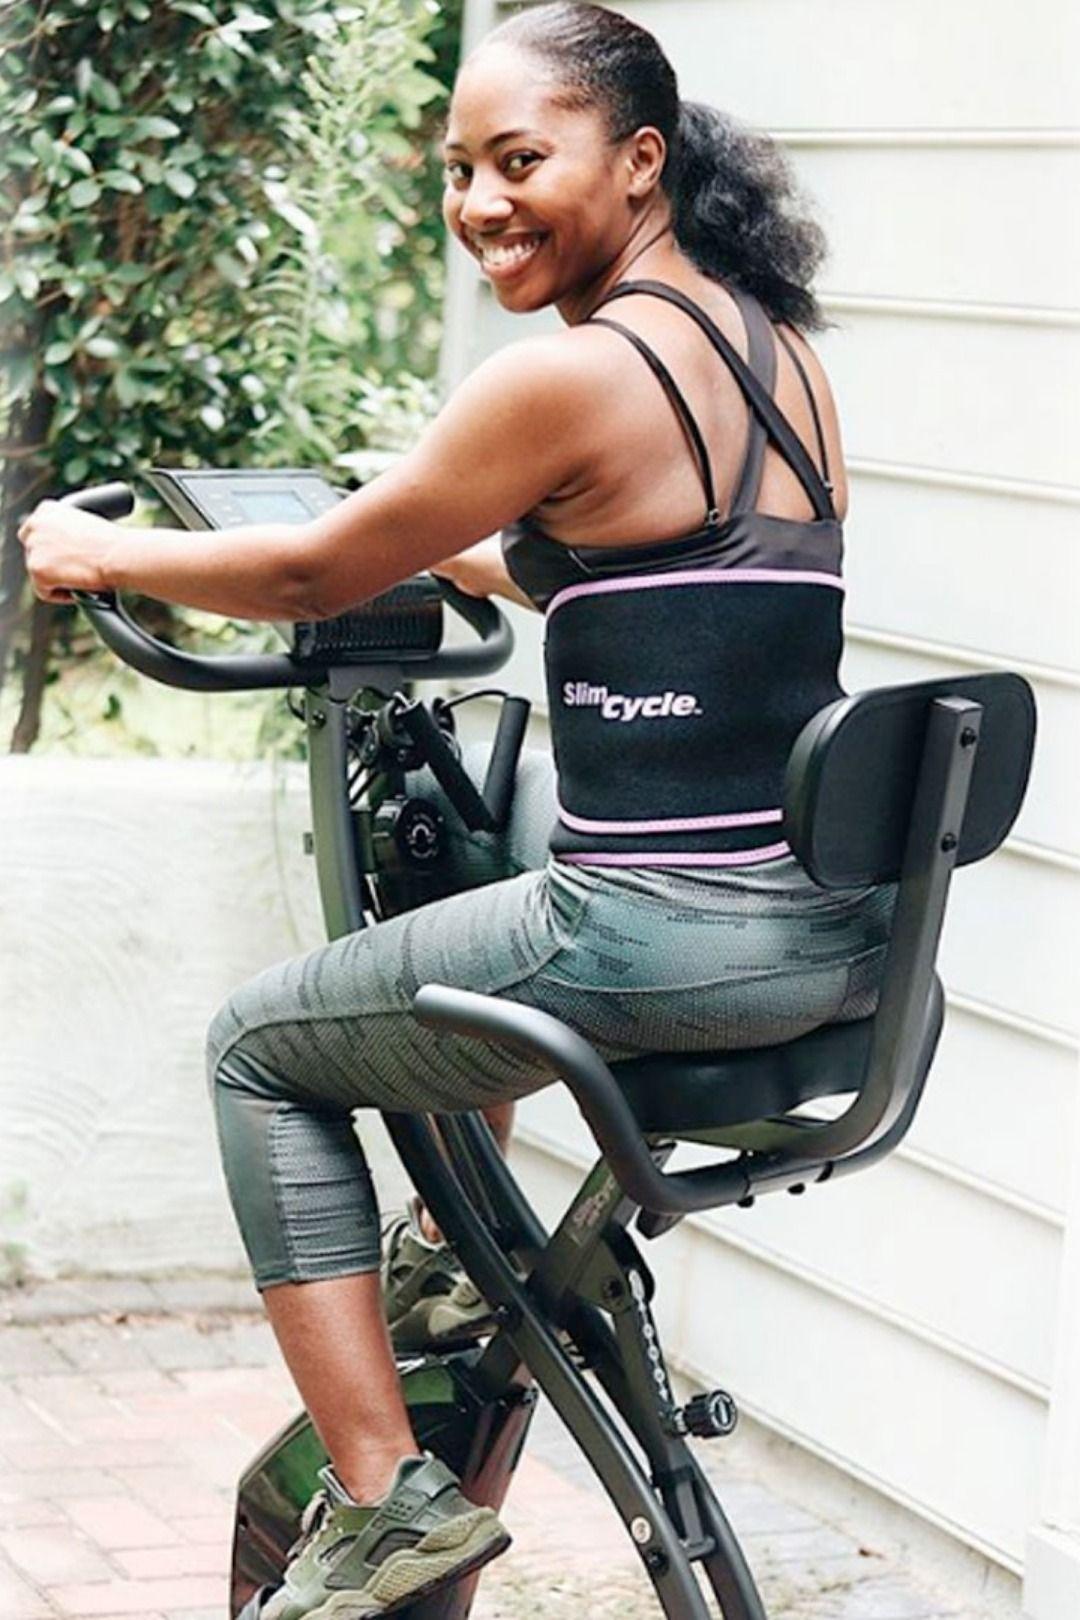 Deluxe slim cycle biking workout intense cardio workout